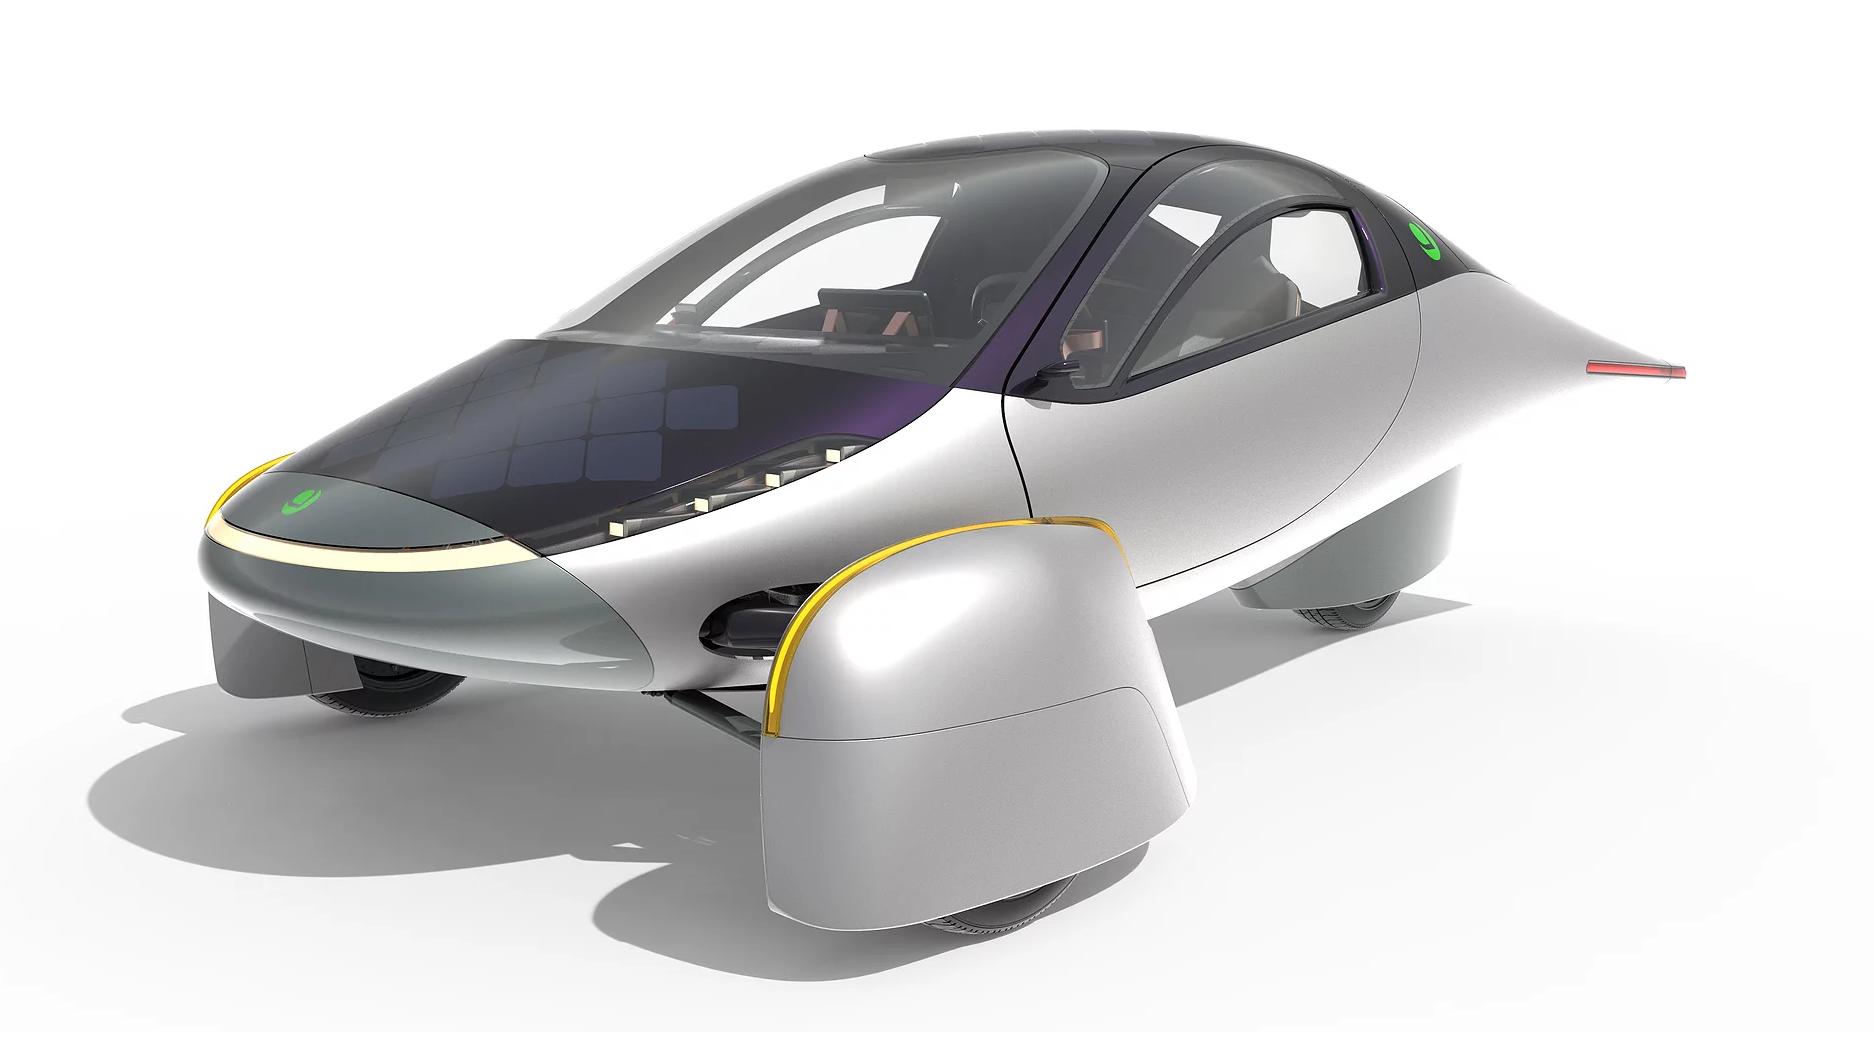 Solar-powered Aptera Paradigm claims 1,000 miles of range - Gearbrain